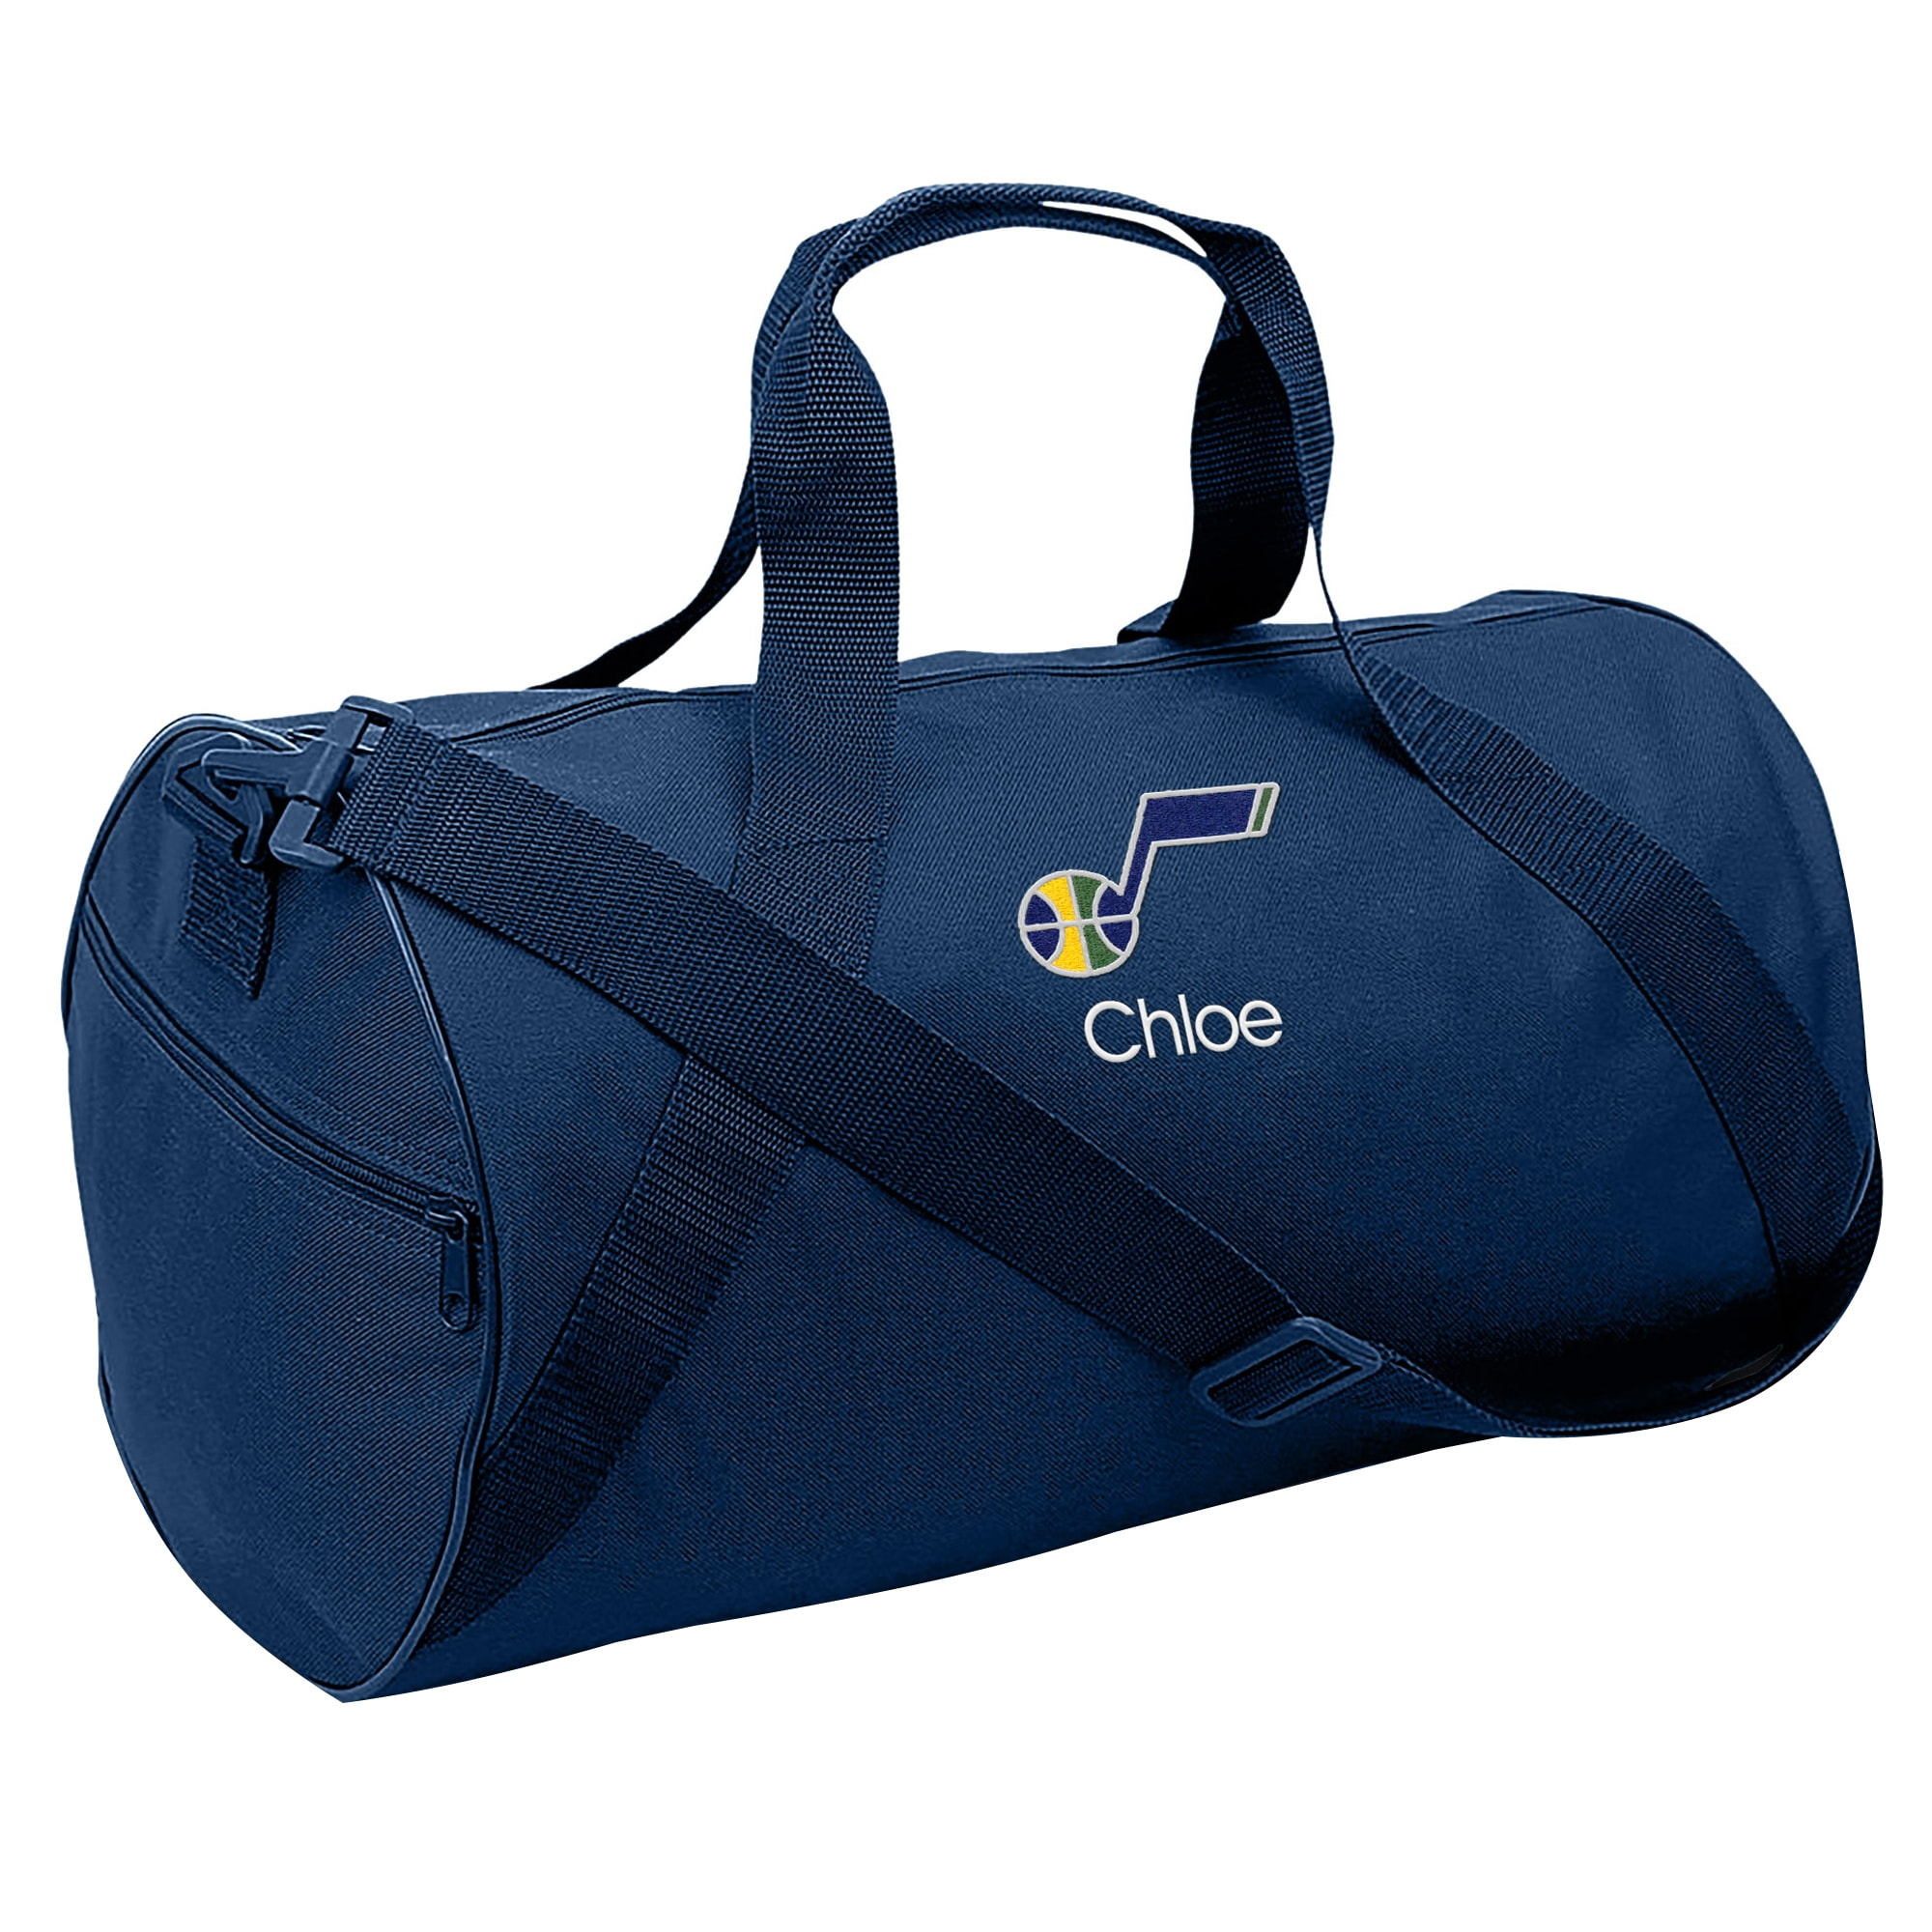 Utah Jazz Youth Personalized Duffle Bag - Navy